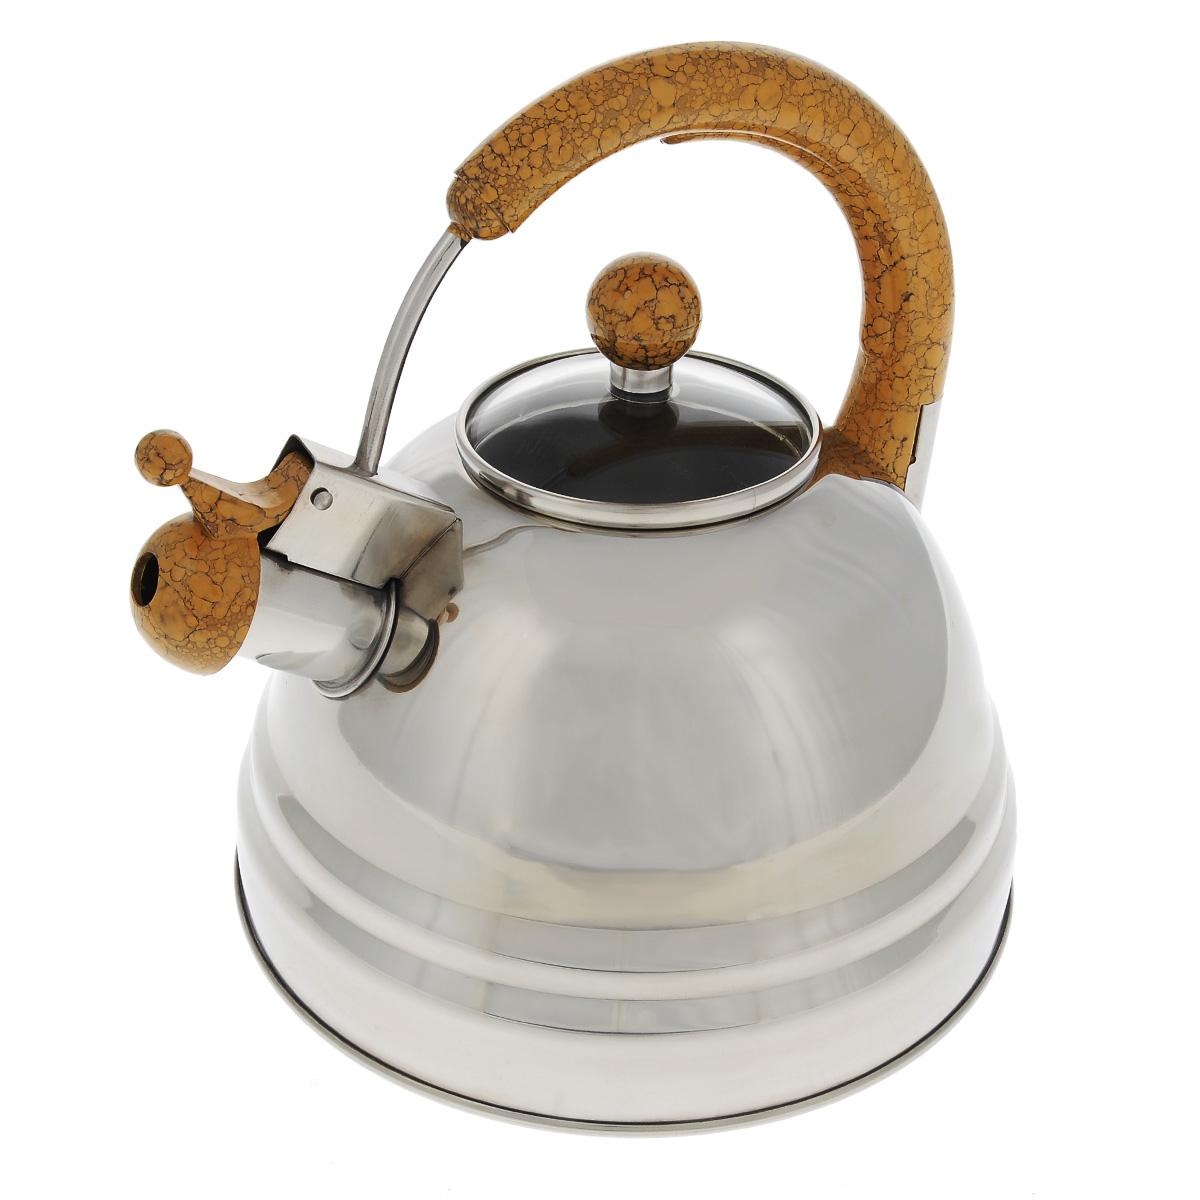 Чайник Bekker Koch со свистком, цвет: коричневый, 3 л. BK-S368 термос bekker koch с помпой 2 5 л bk 4033